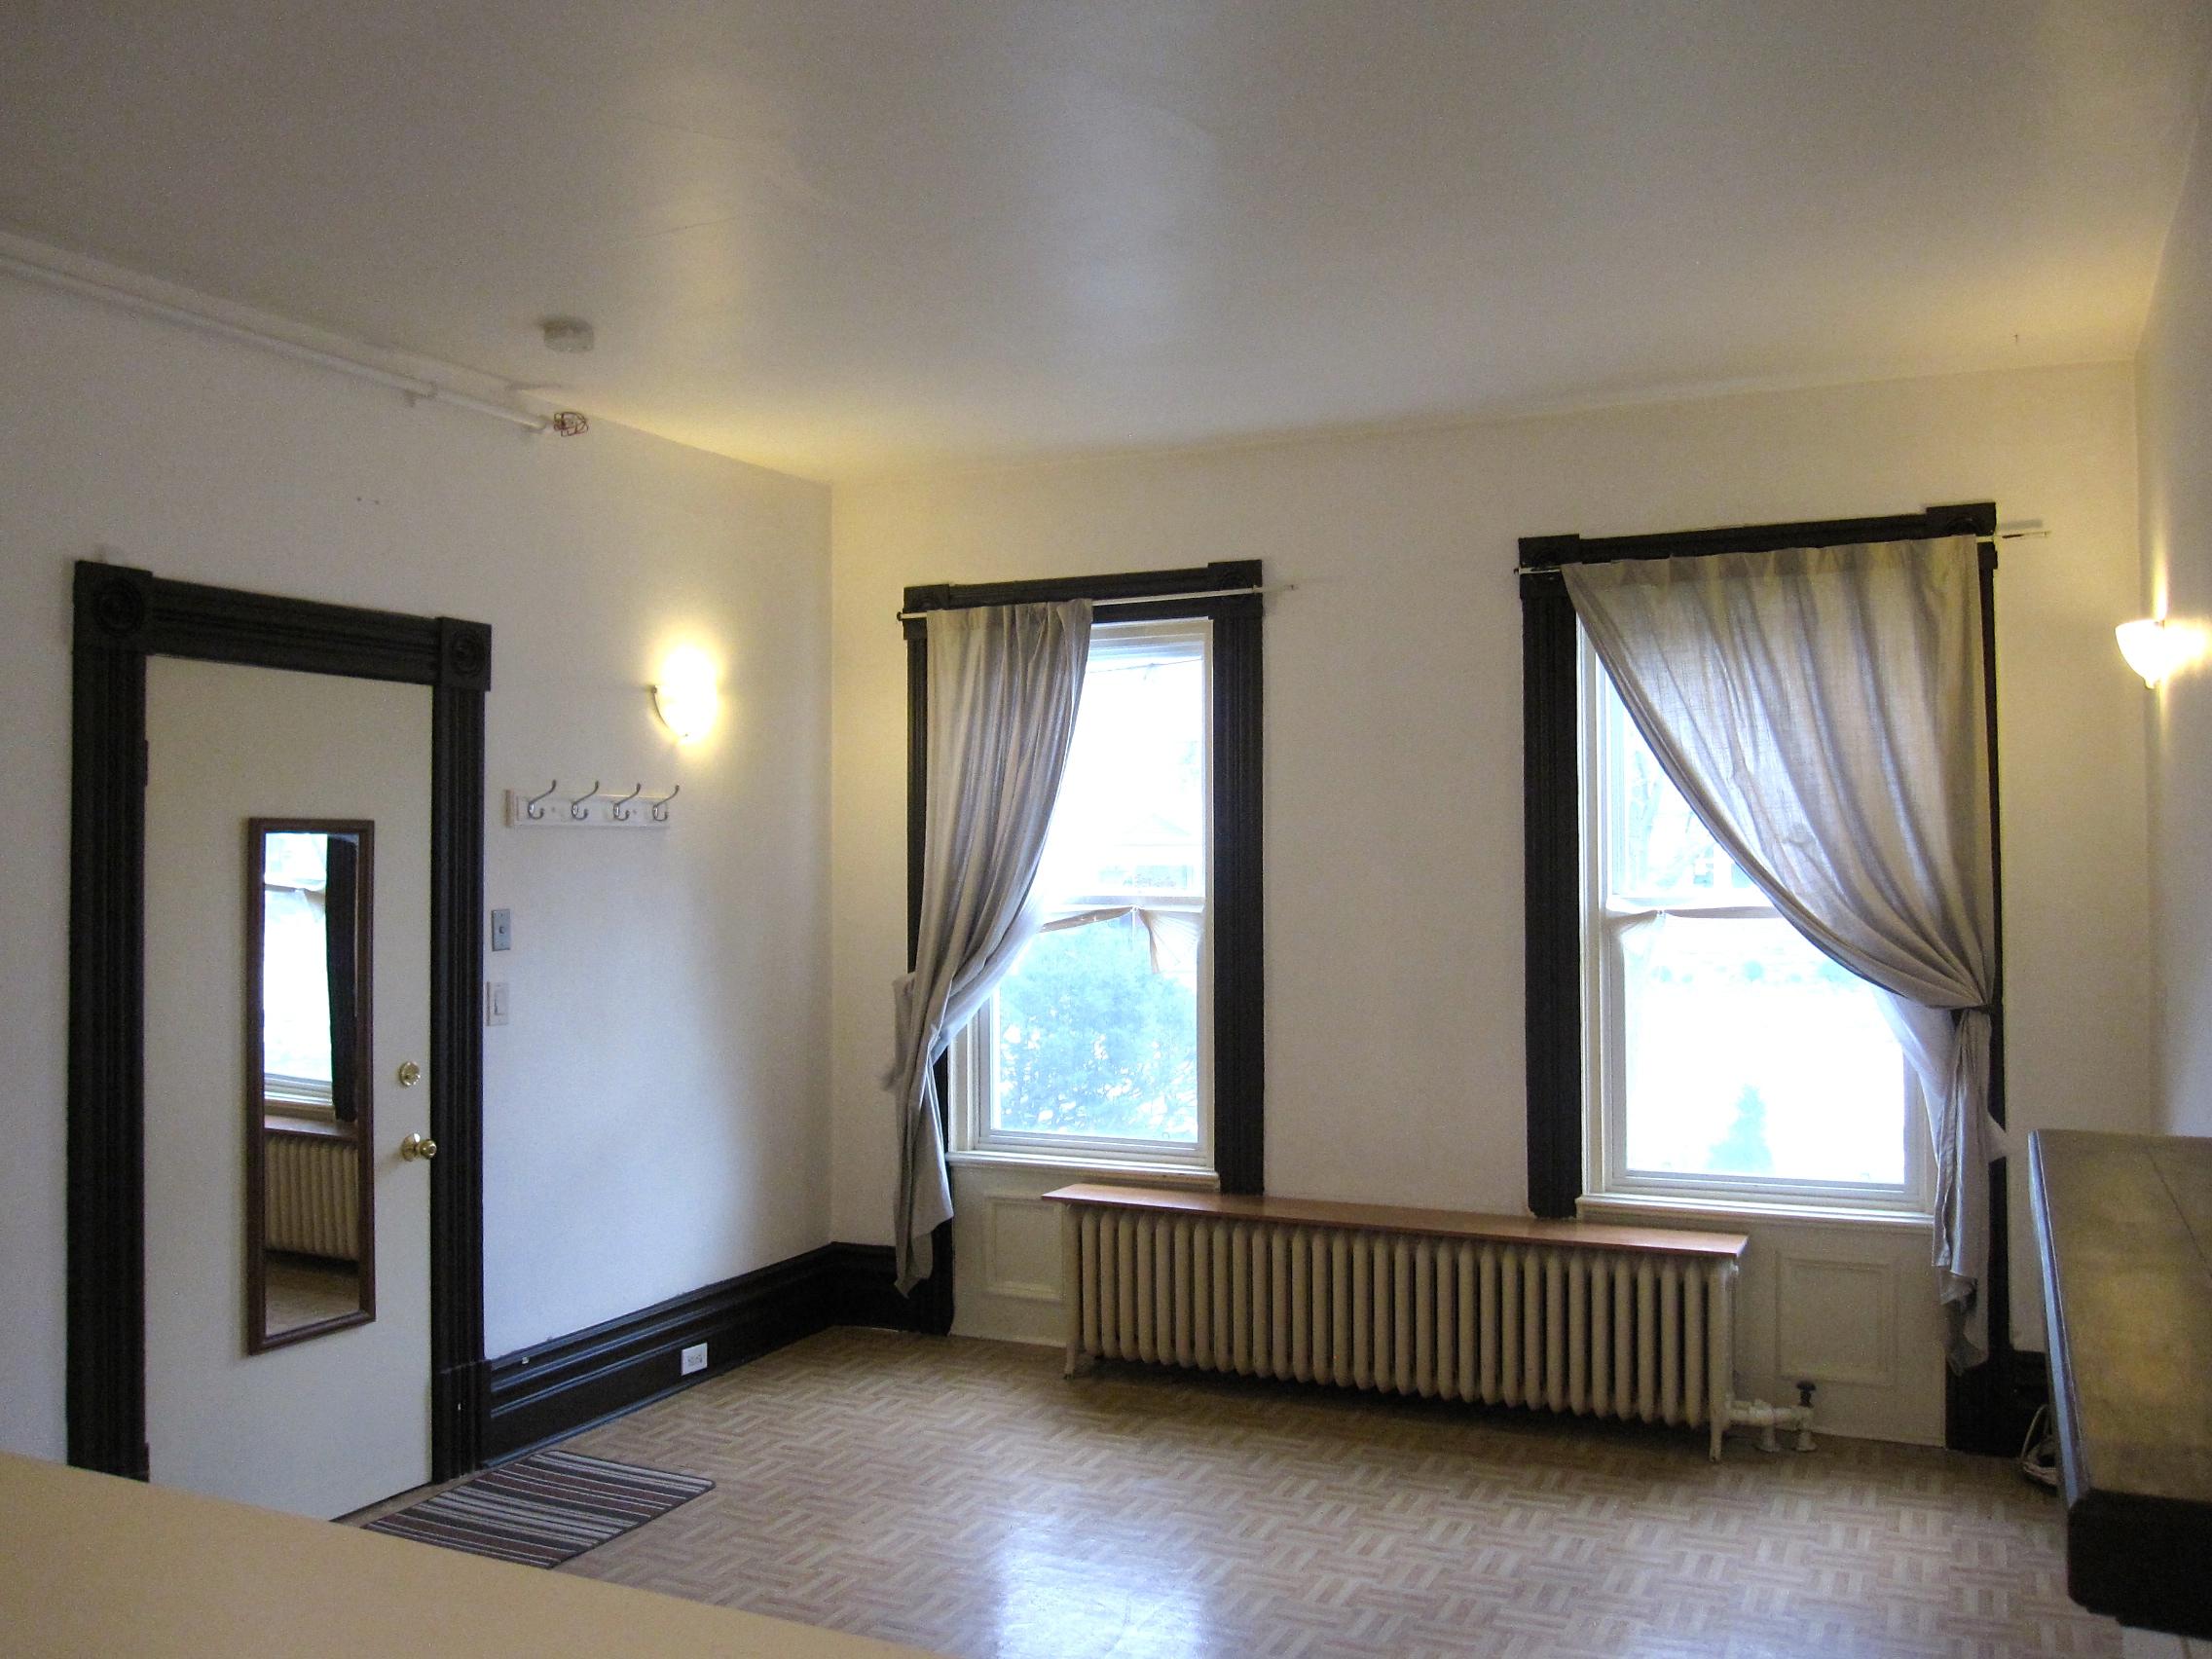 Charming Bachelor Apartment in Downtown Brampton!